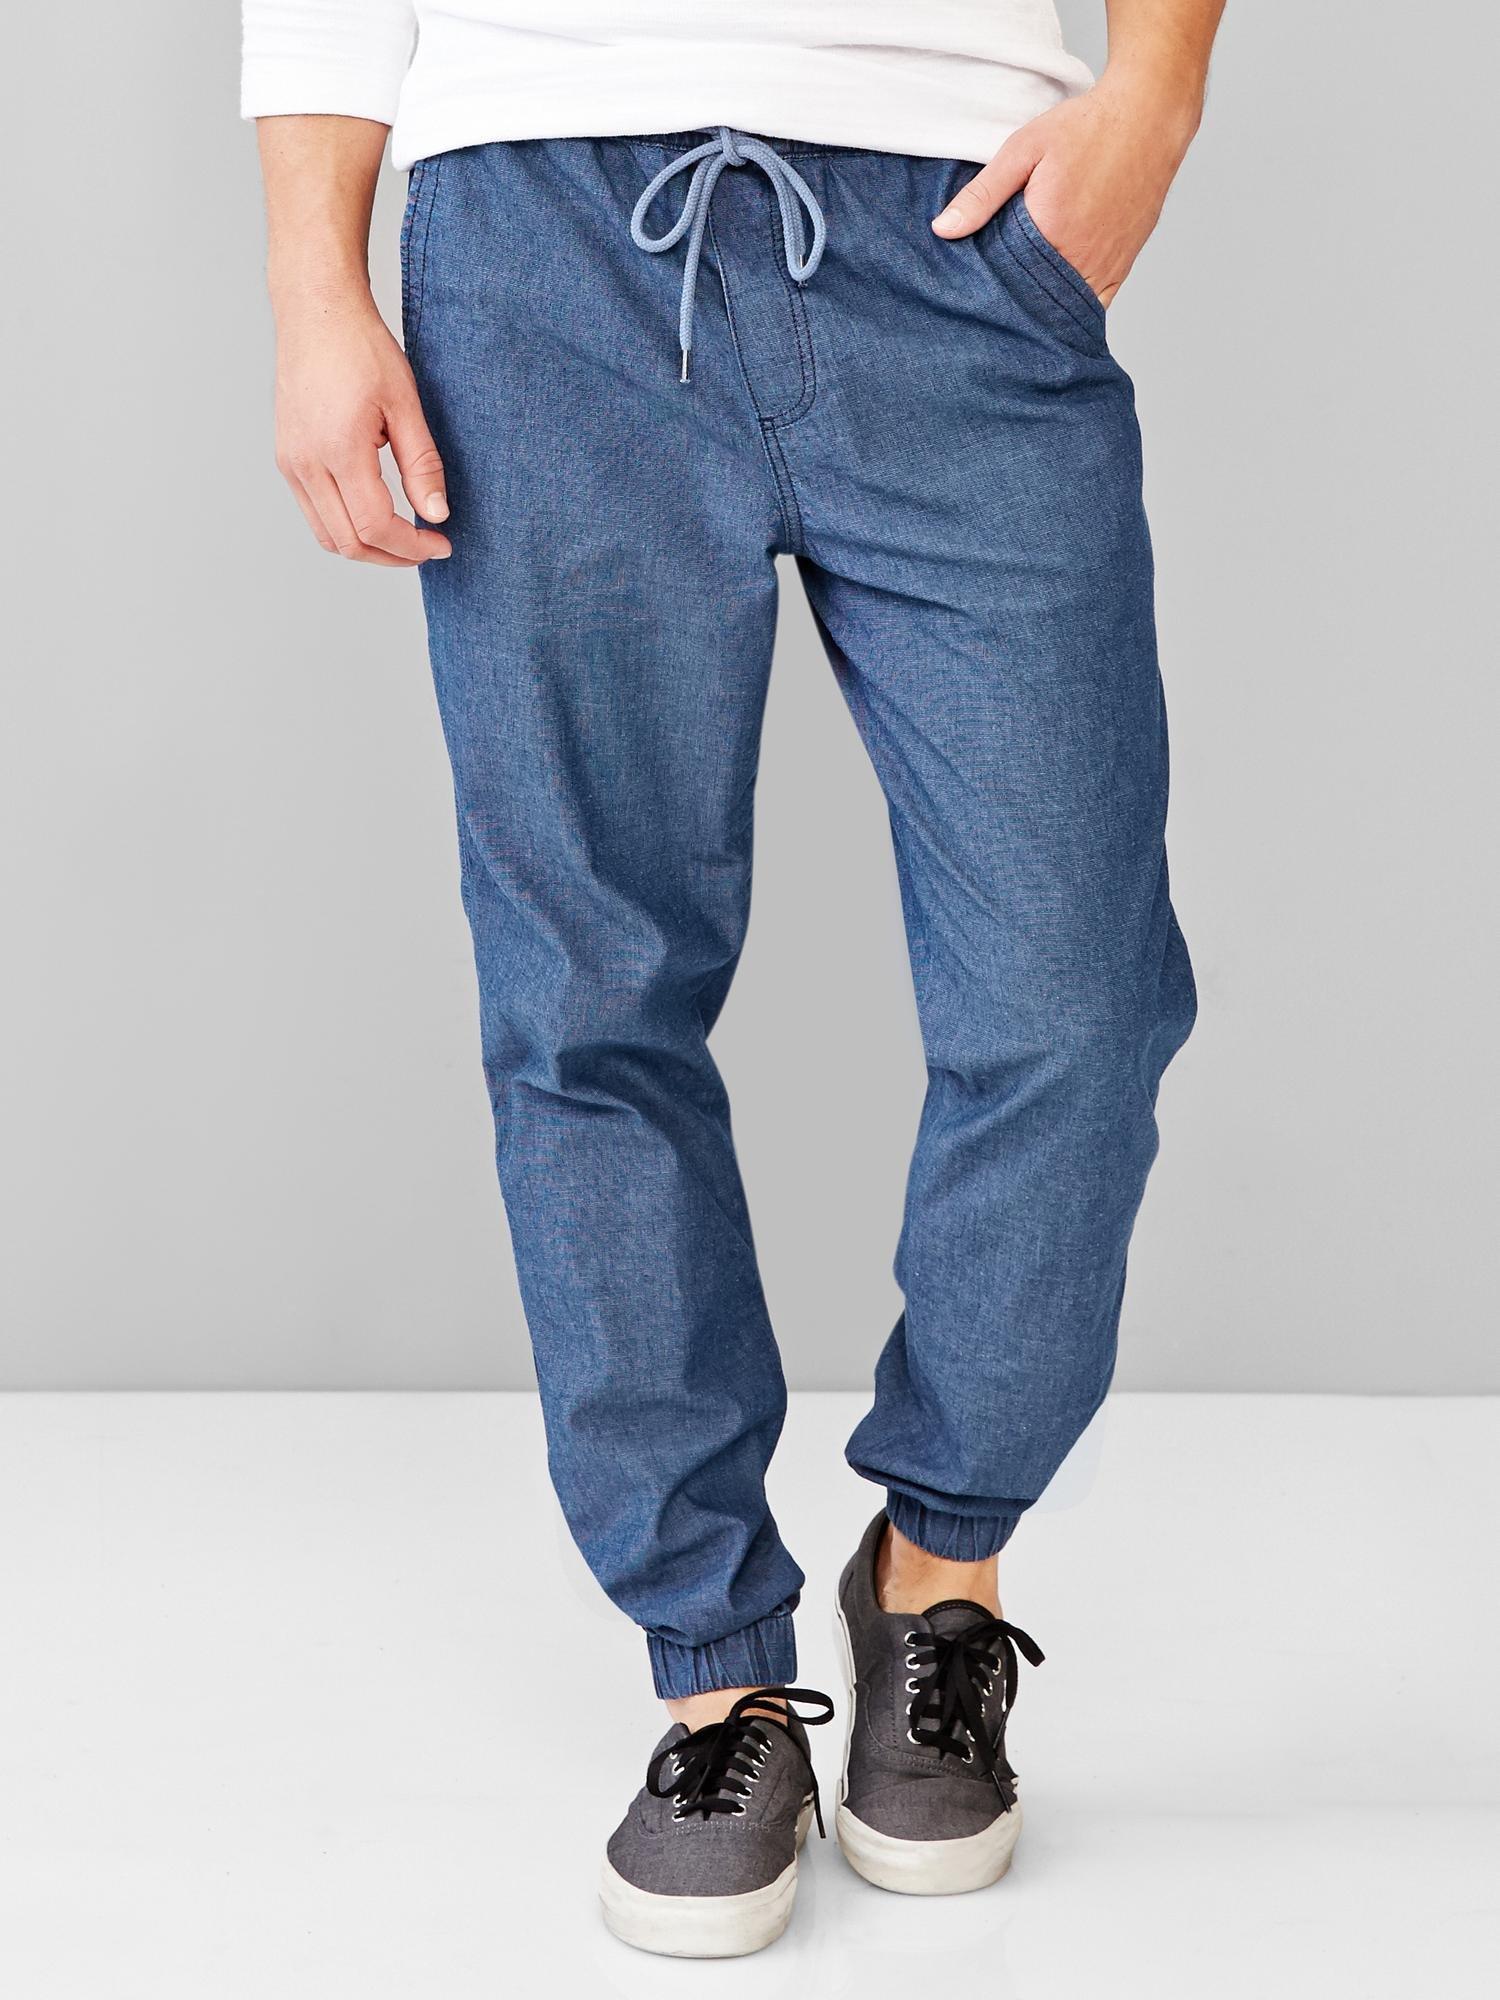 Original All Sales  Gap  Sweaters  Sweater Jogger Pants